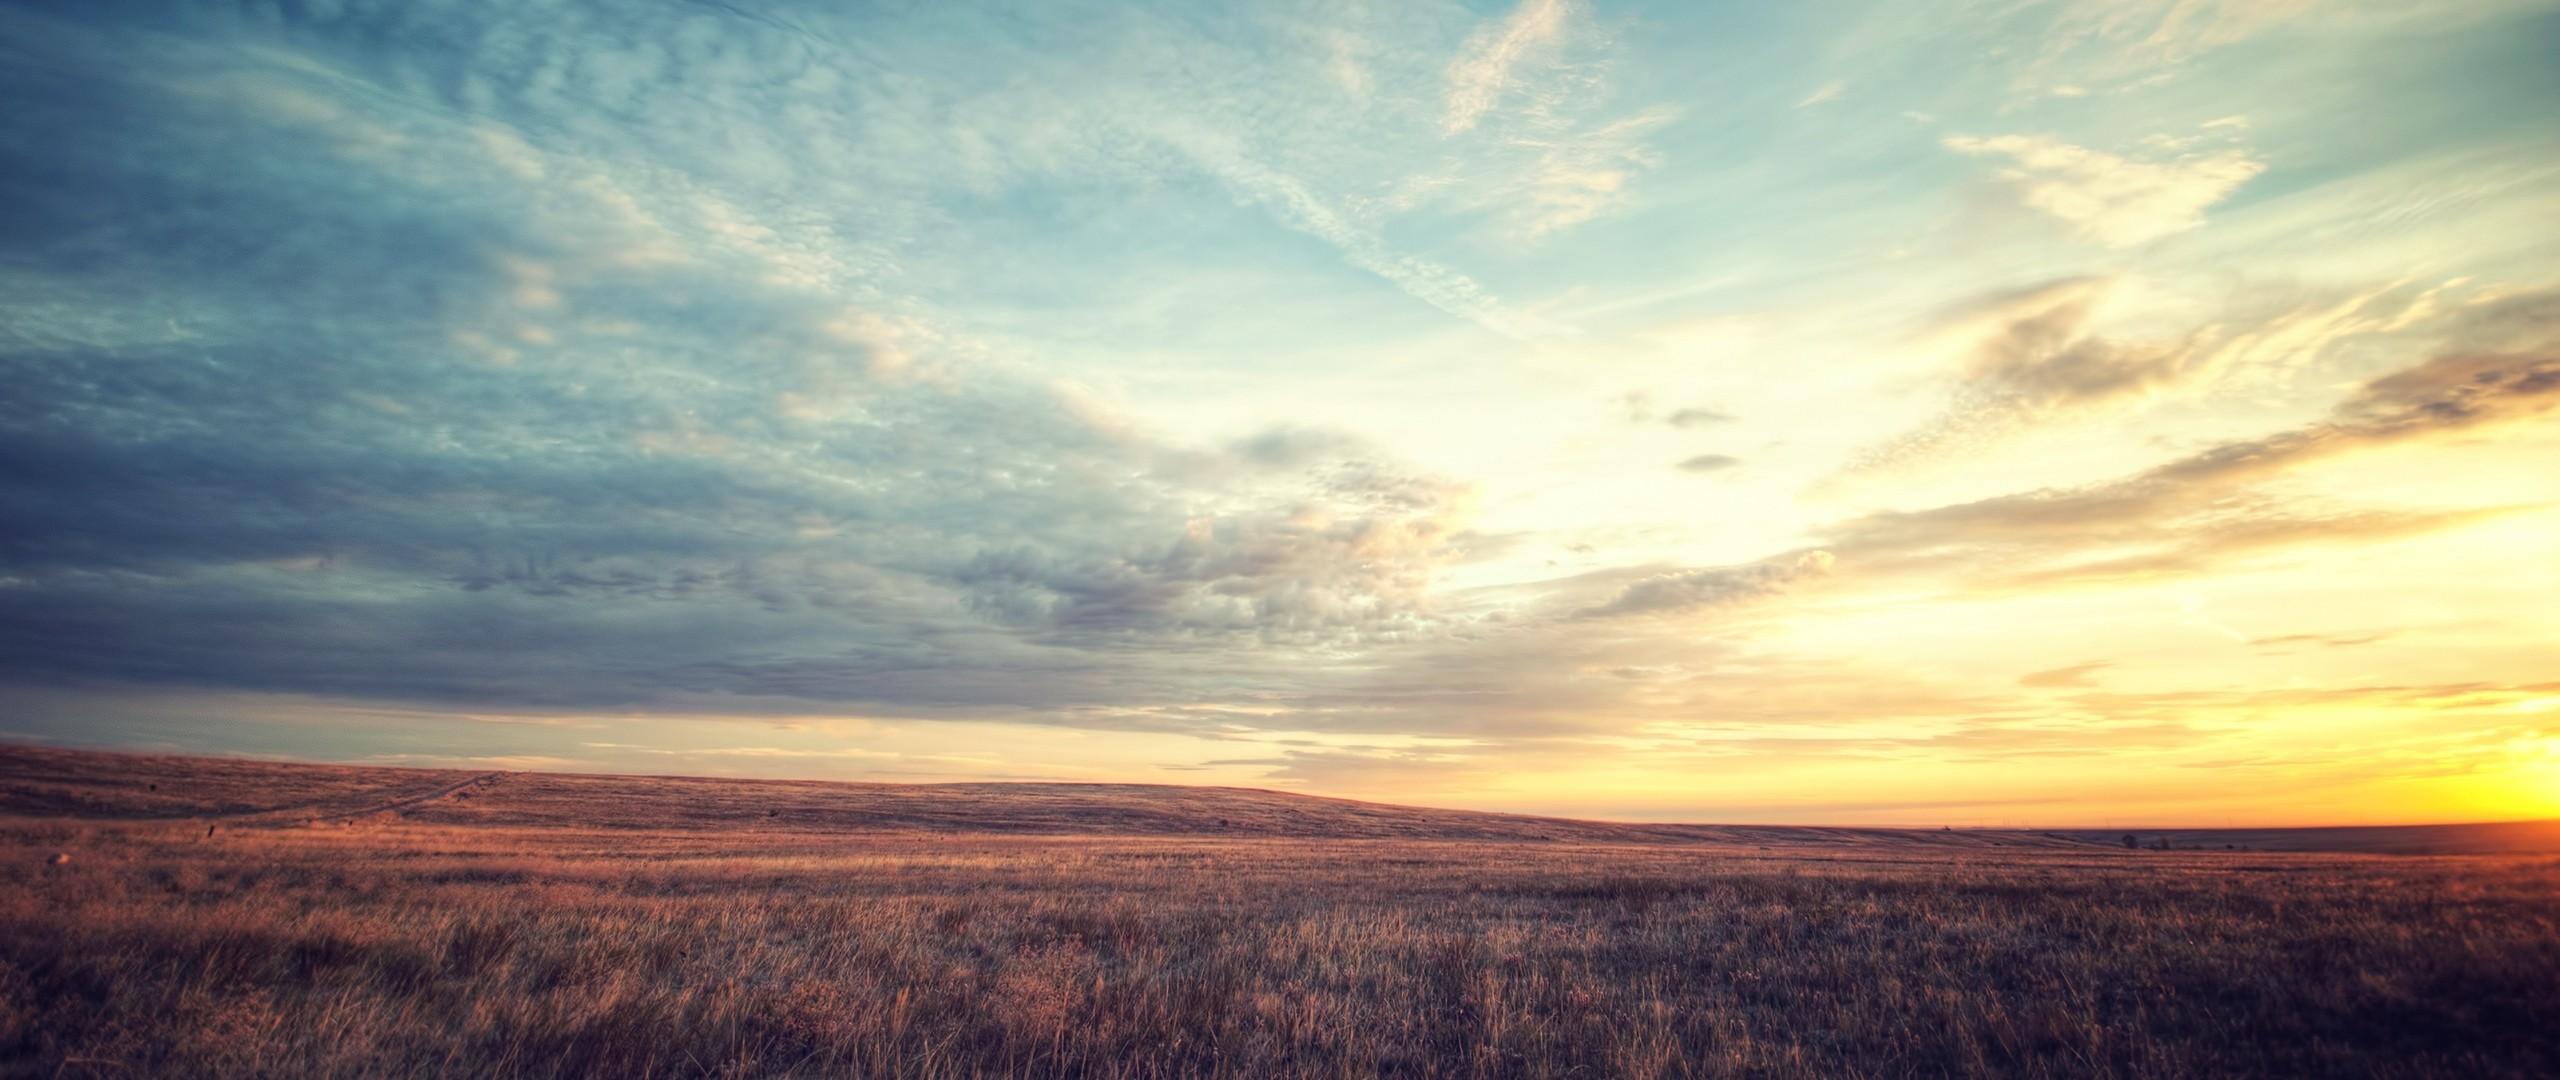 Preview wallpaper field, dawn, sky, beautiful scenery 2560×1080